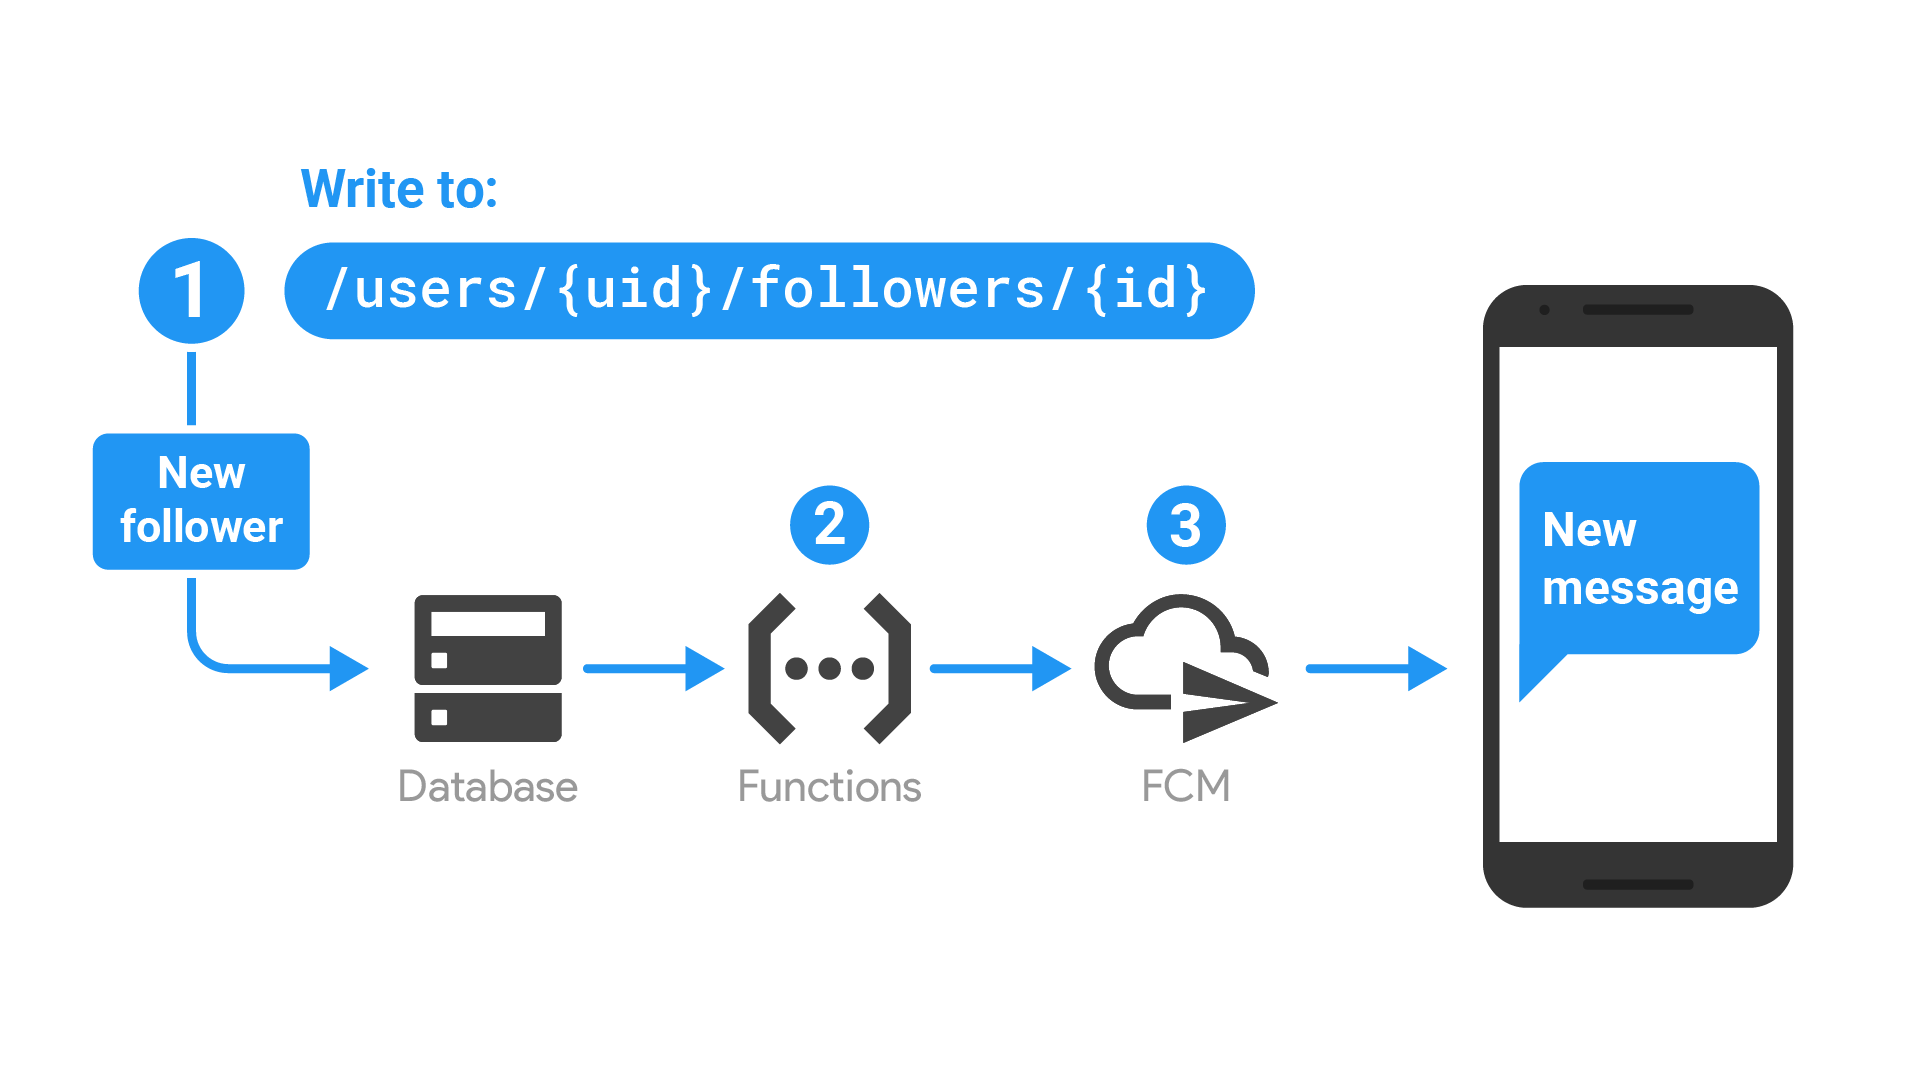 [Firebase] إرسال الإشعارات عبر Cloud Functions وبدون سيرفر خارجي